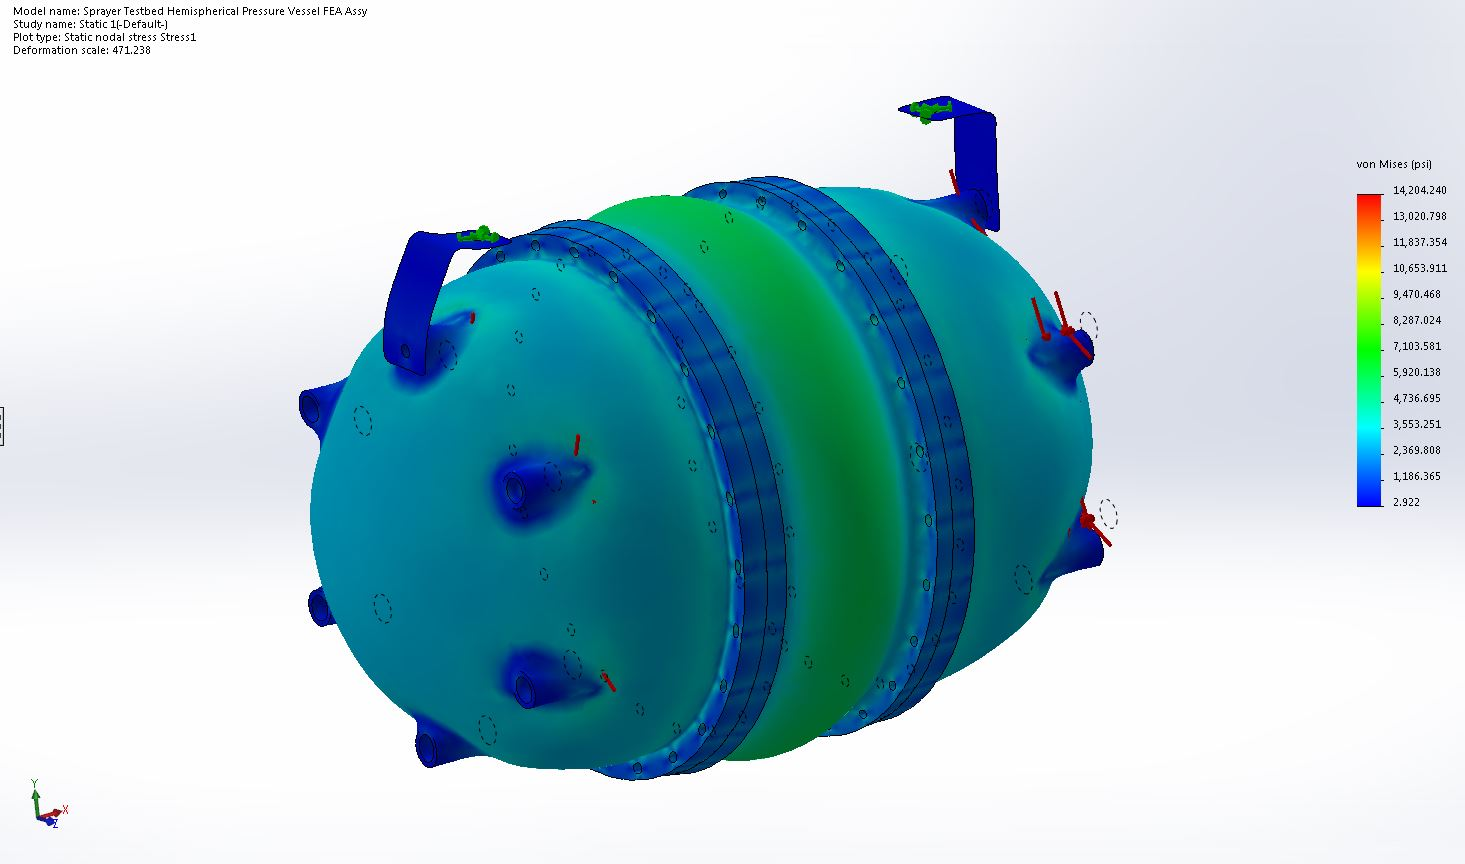 FEA Analysis of Pressure Vessel